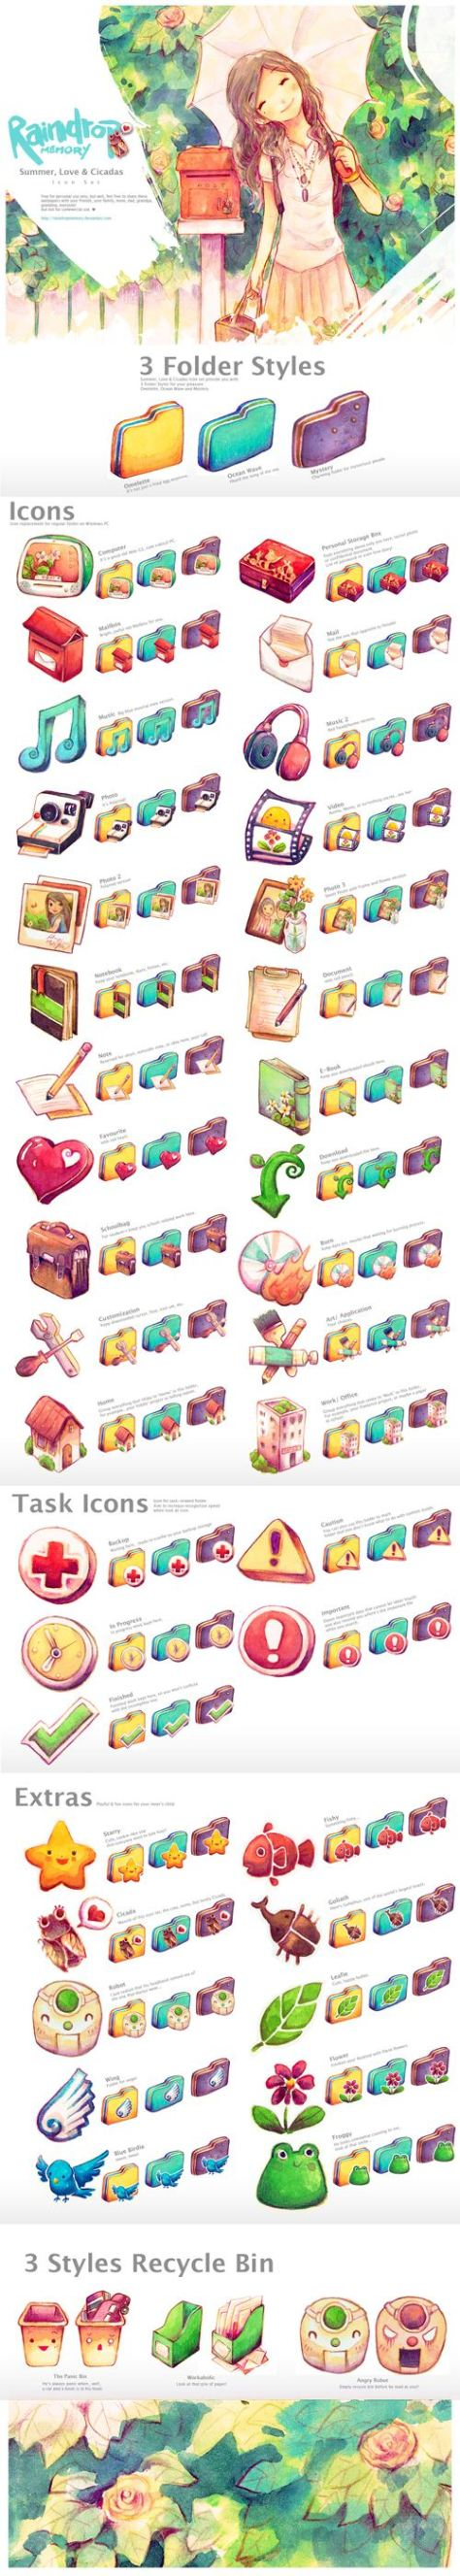 iconos-cartoon-colorfull